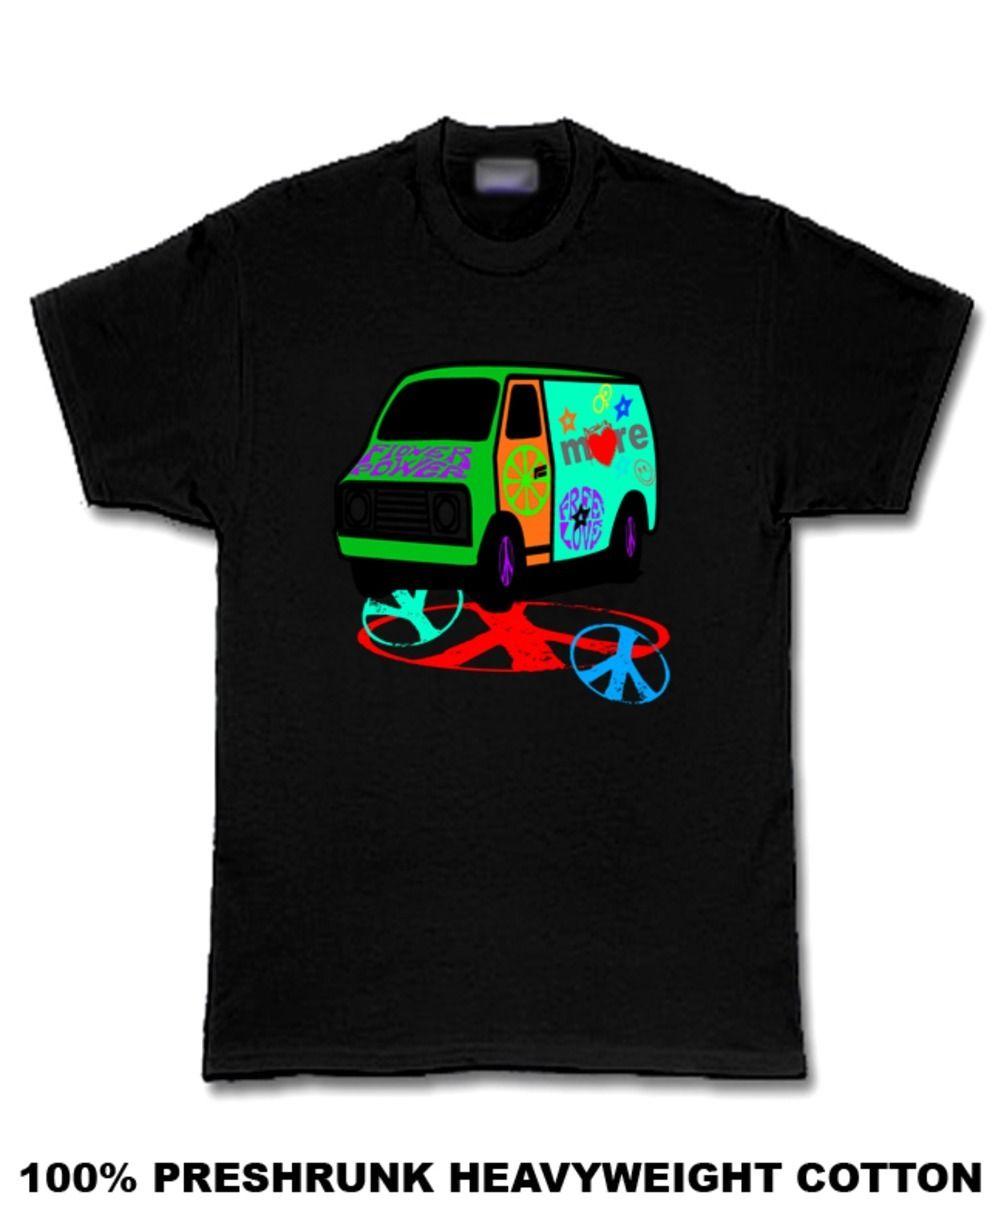 More Love 70s Van for black new age hippie T Shirt Men'S T-Shirts Short Sleeve O-Neck Cotton Men'S T-Shirt Fashion